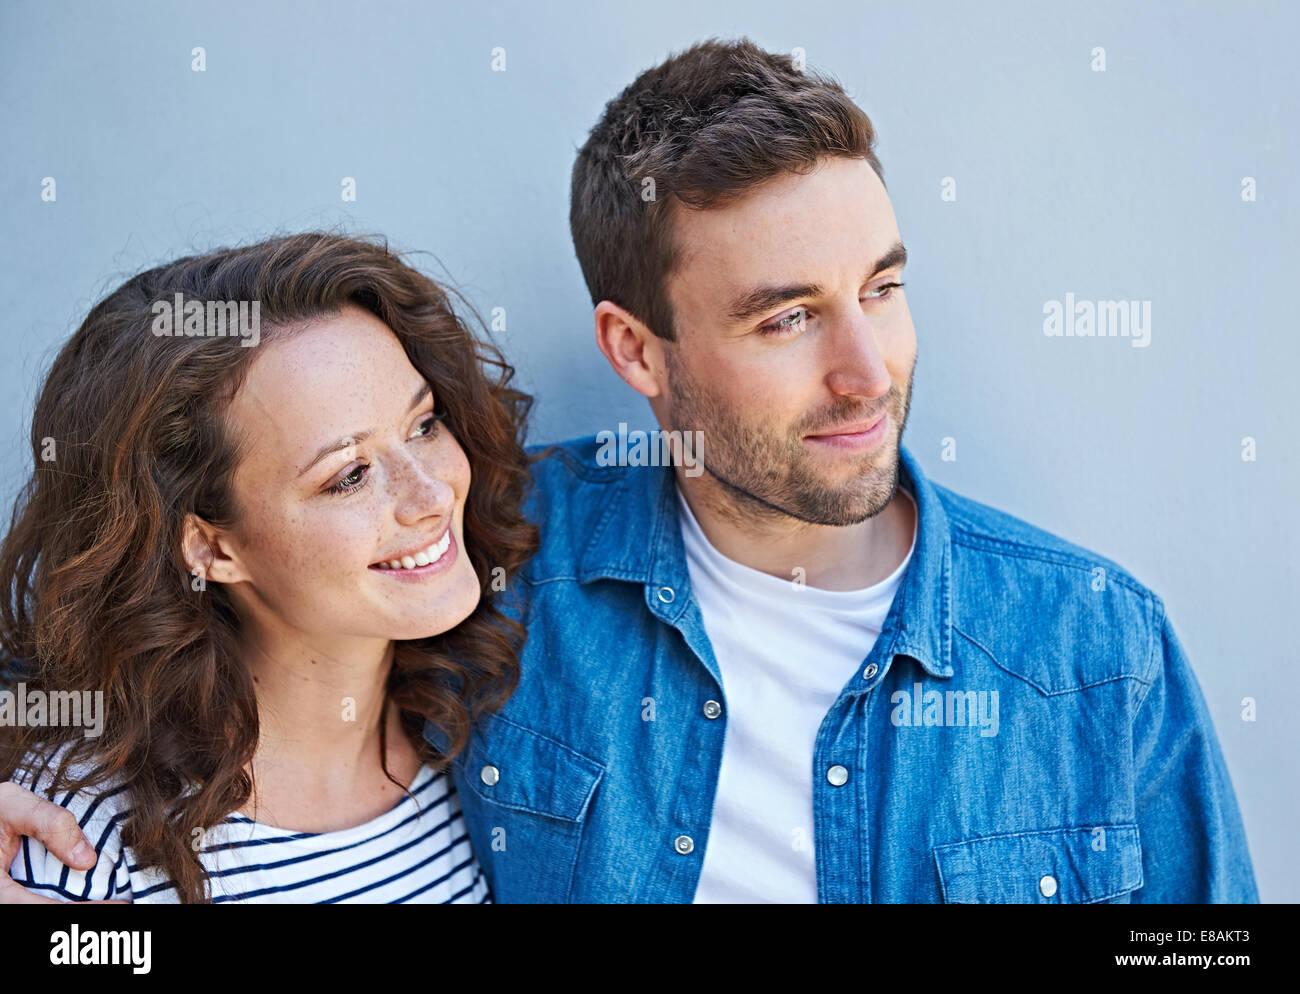 Cerca de la pareja al lado Imagen De Stock